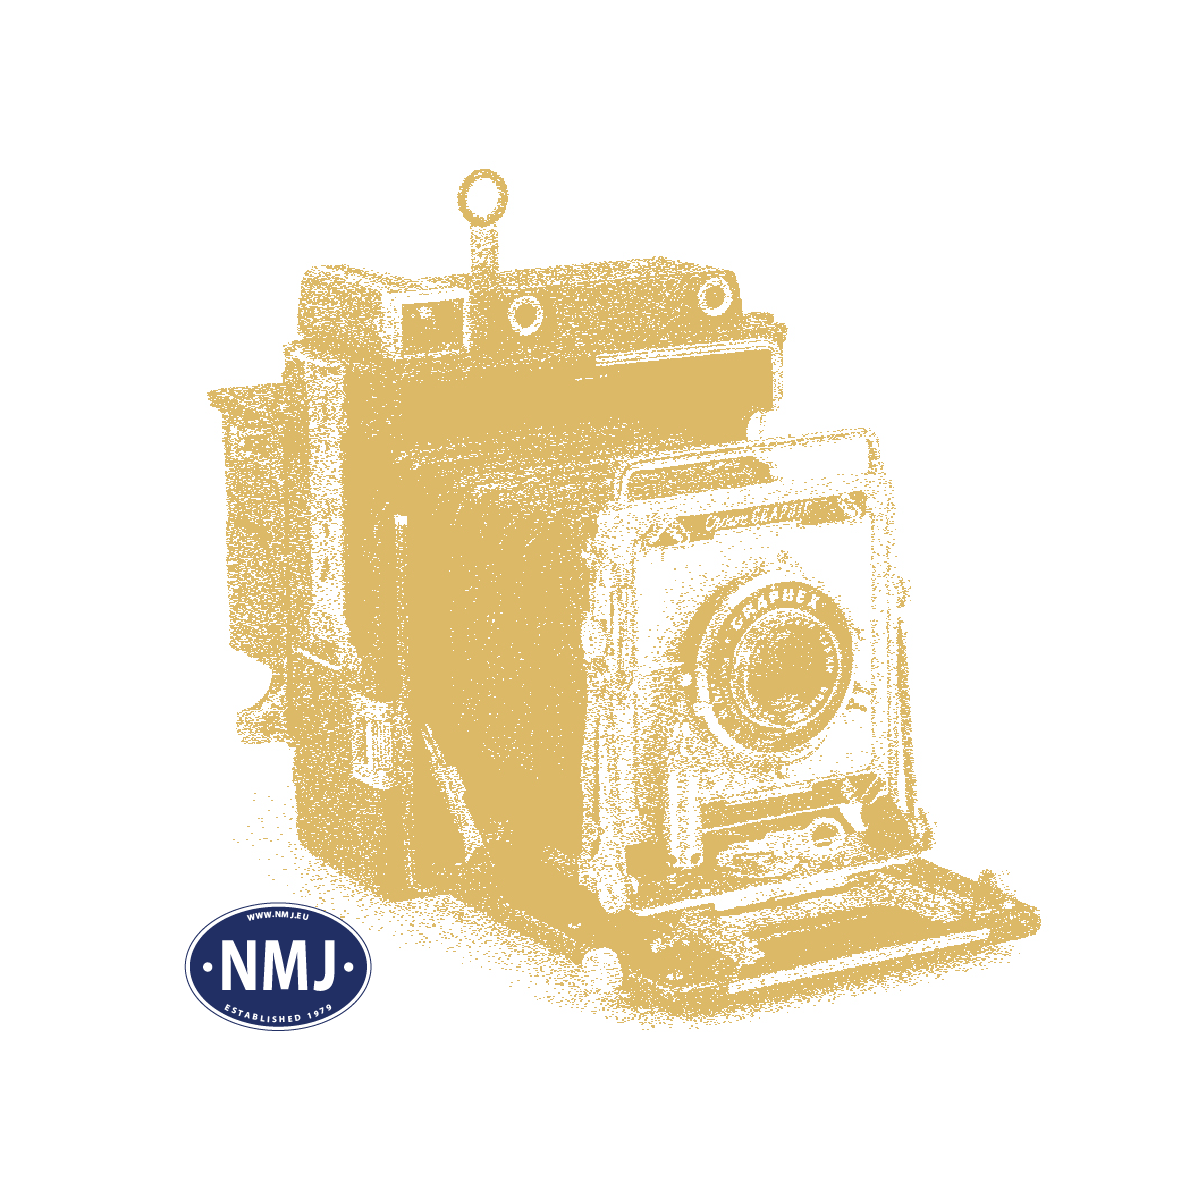 NMJT90020 - NMJ Topline NSB Di3a 617 Red/Black, DC